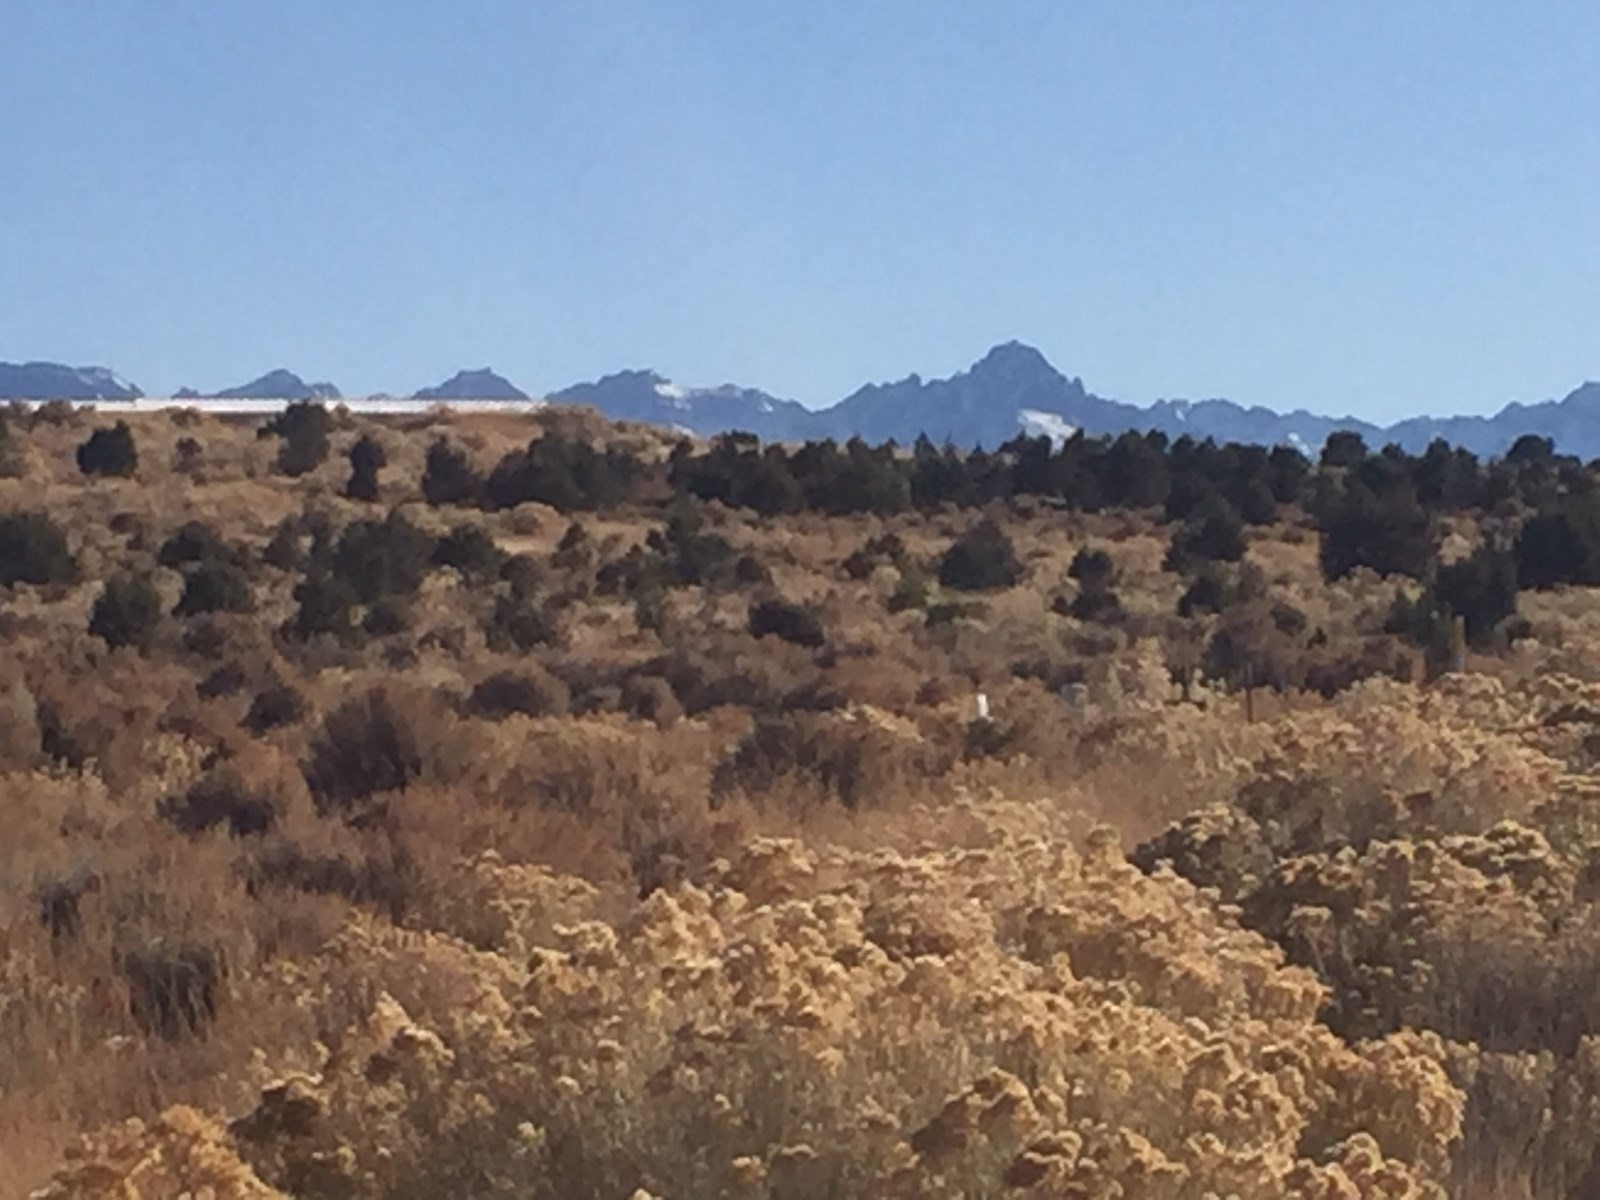 Mountain View Land For Sale Log Hill Mesa Montrose Colorado